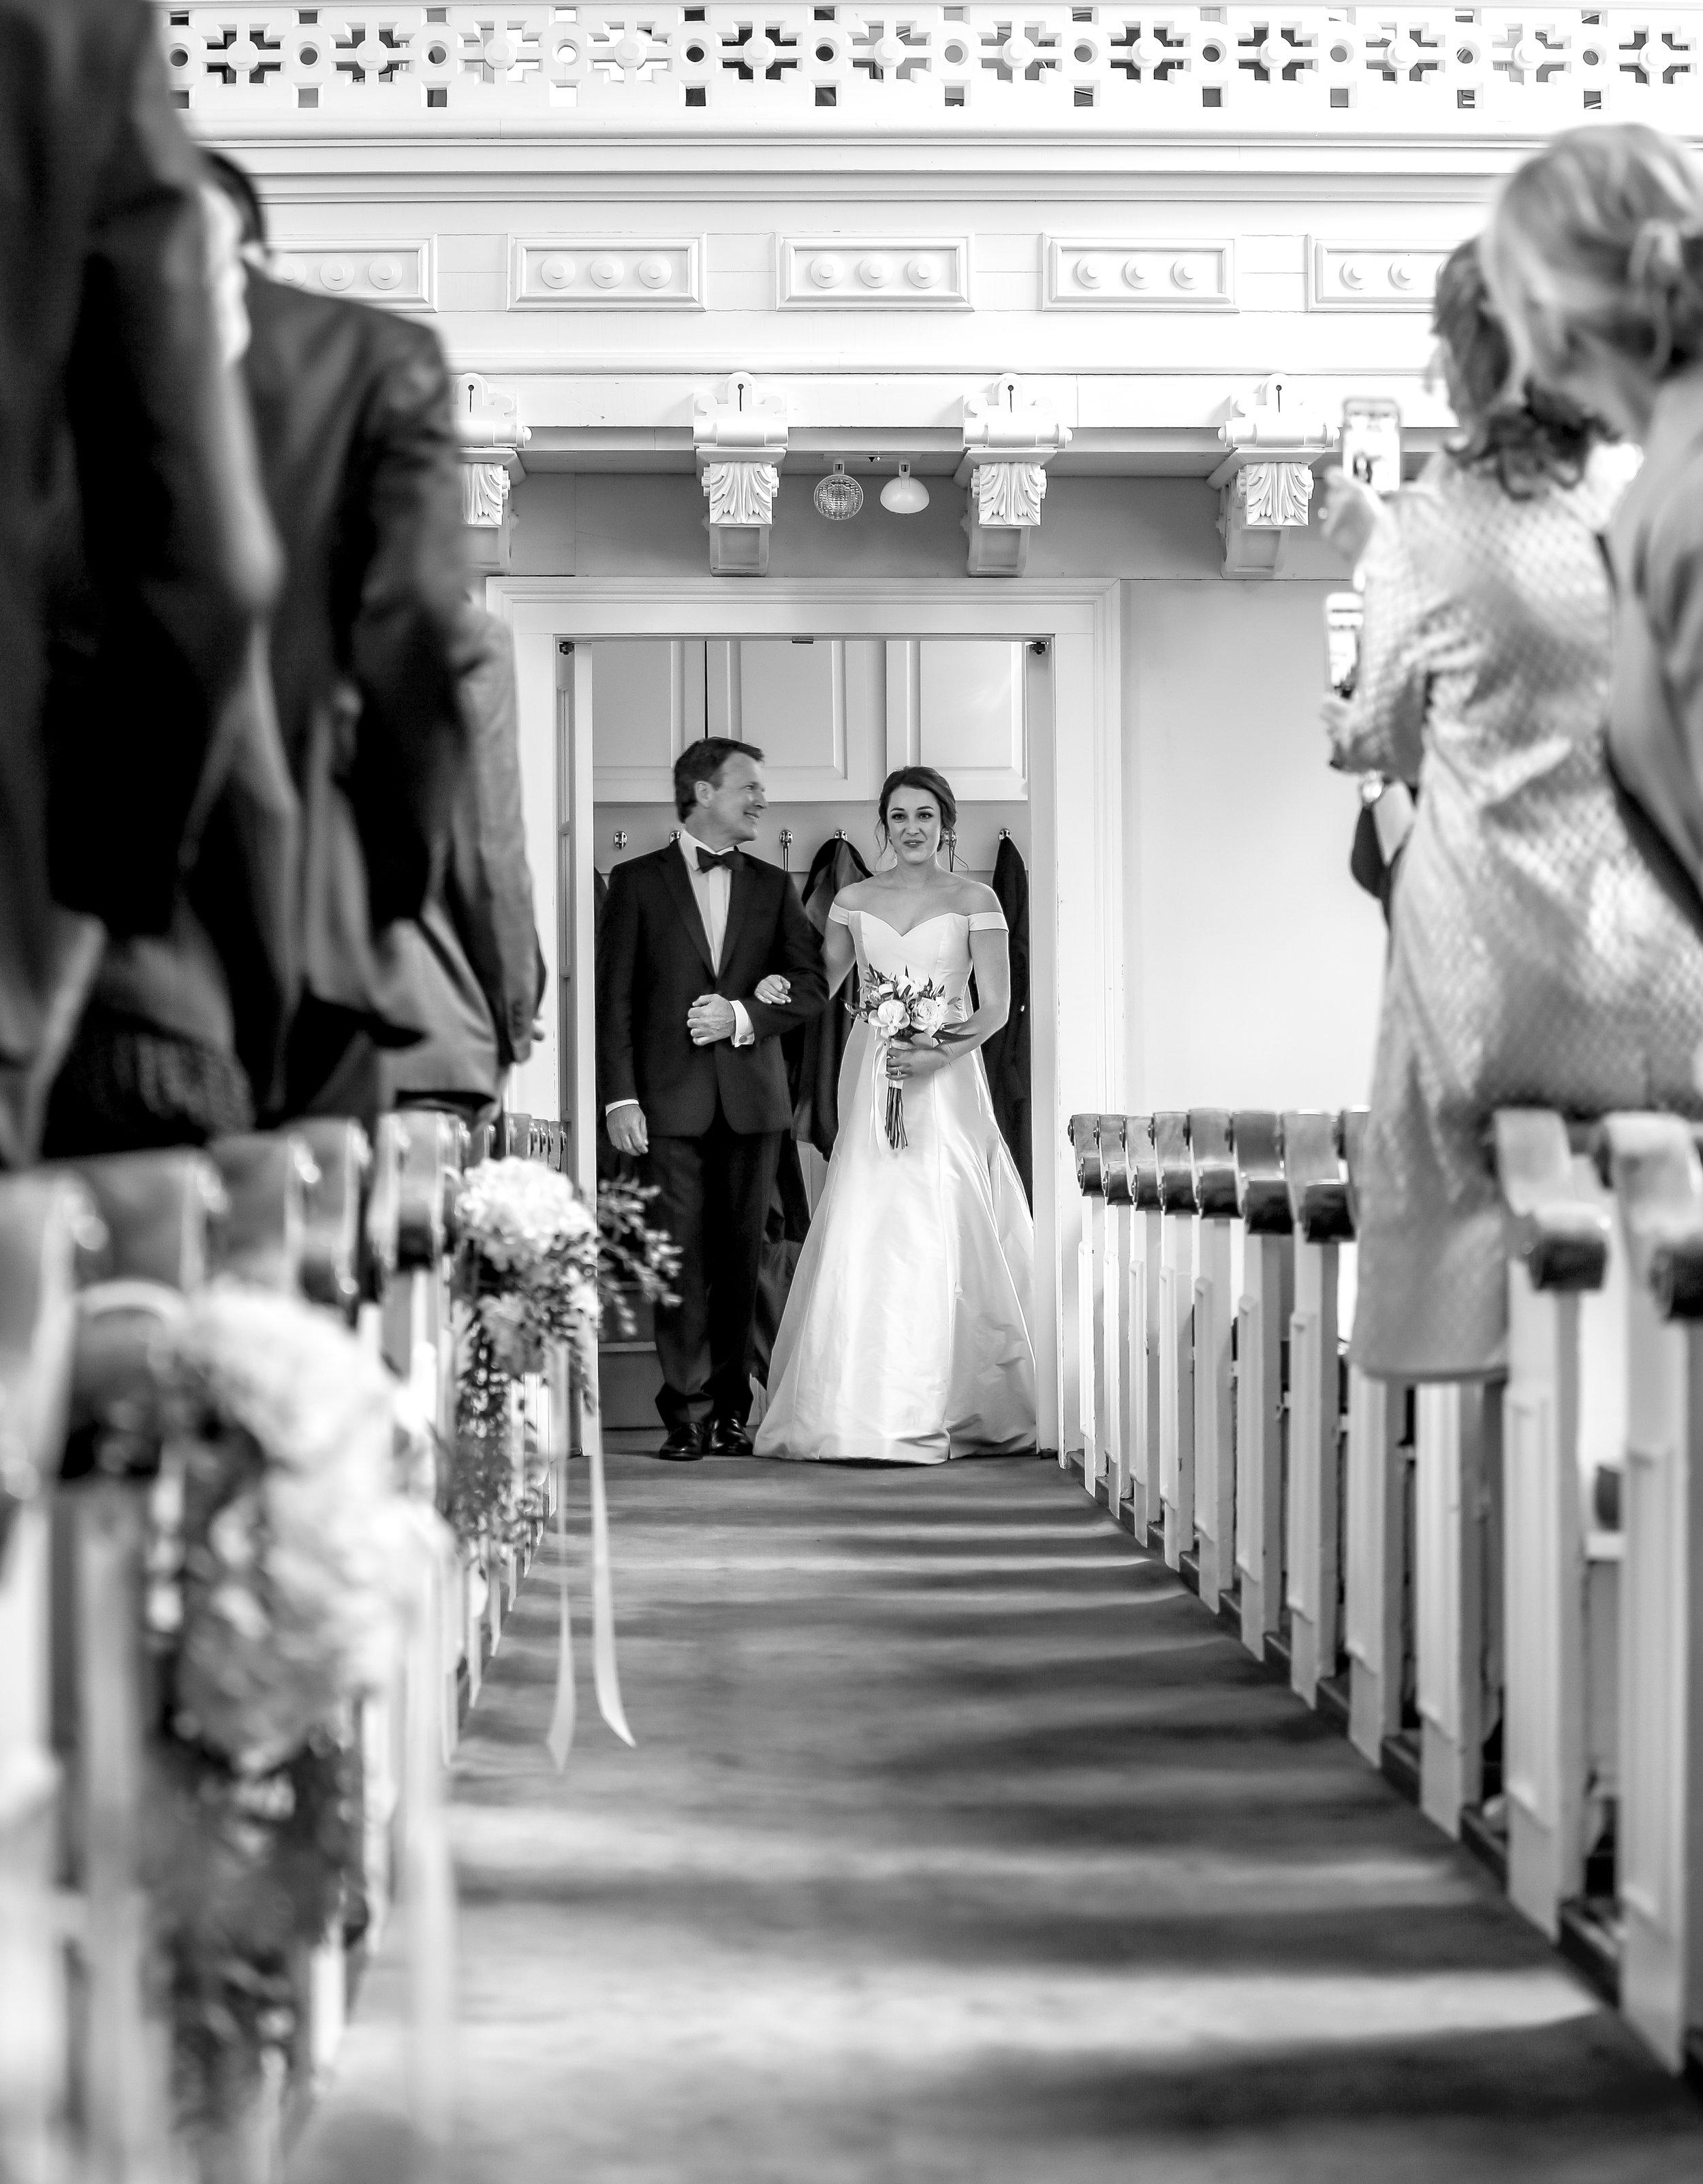 Jeremie_Barlow_Photography_Steffen_Sudyam_wedding_2018-441.jpg